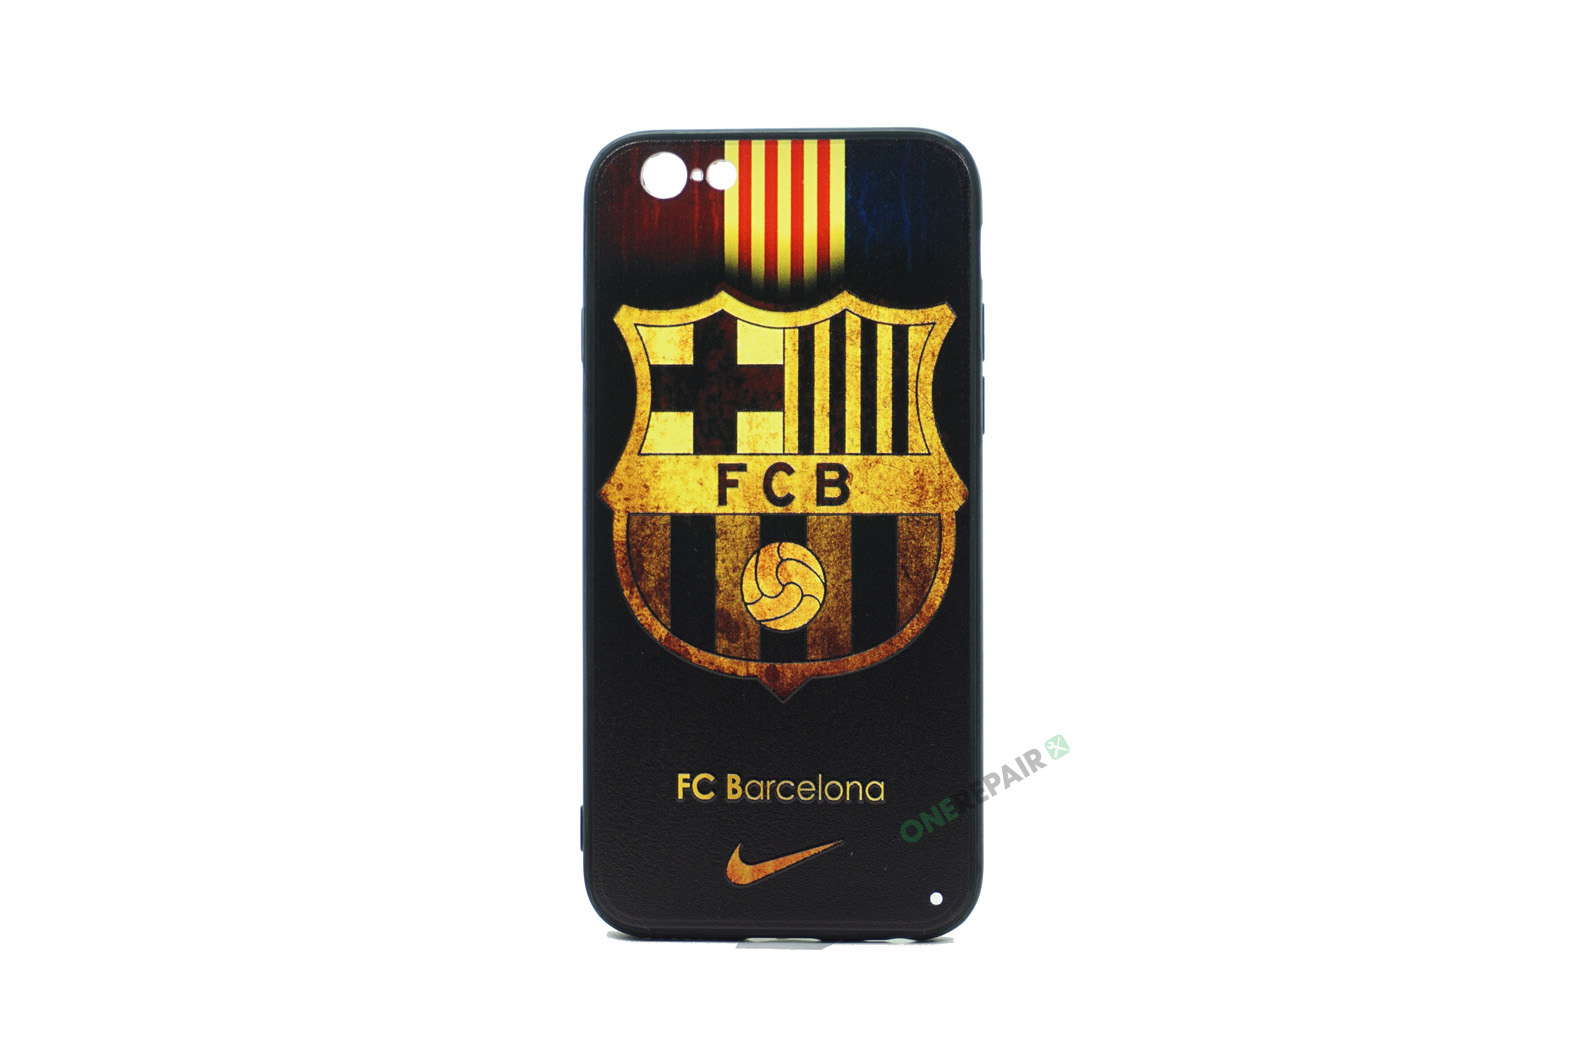 iPhone 6, 6S, A1549, A1586, A1589, A1633, A1688, A1700, A1691, Apple, Bagcover, Cover, Billig, Motiv, Fodbold, Klub, Barcelona, FC, Sort